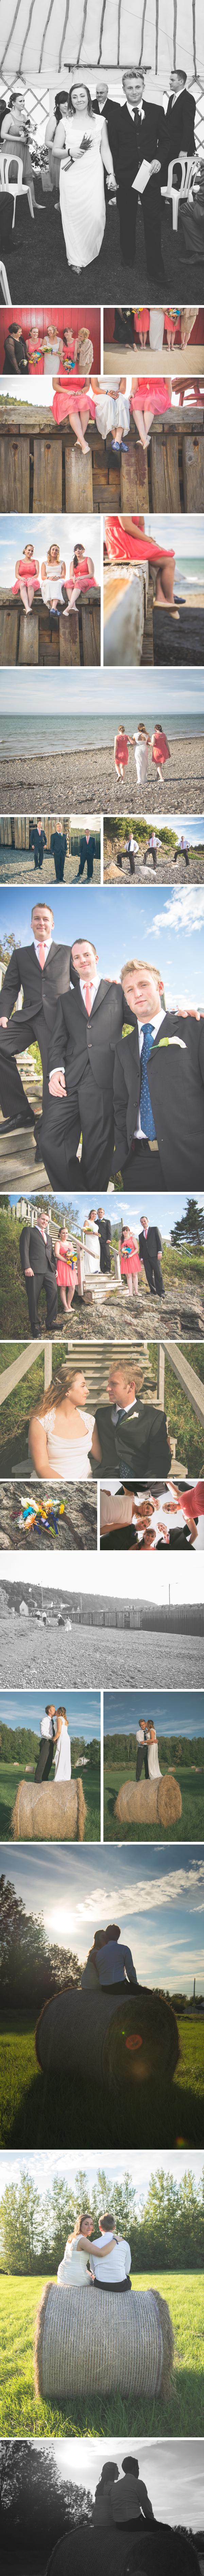 halifax wedding photography one blue fish nova scotia photographer